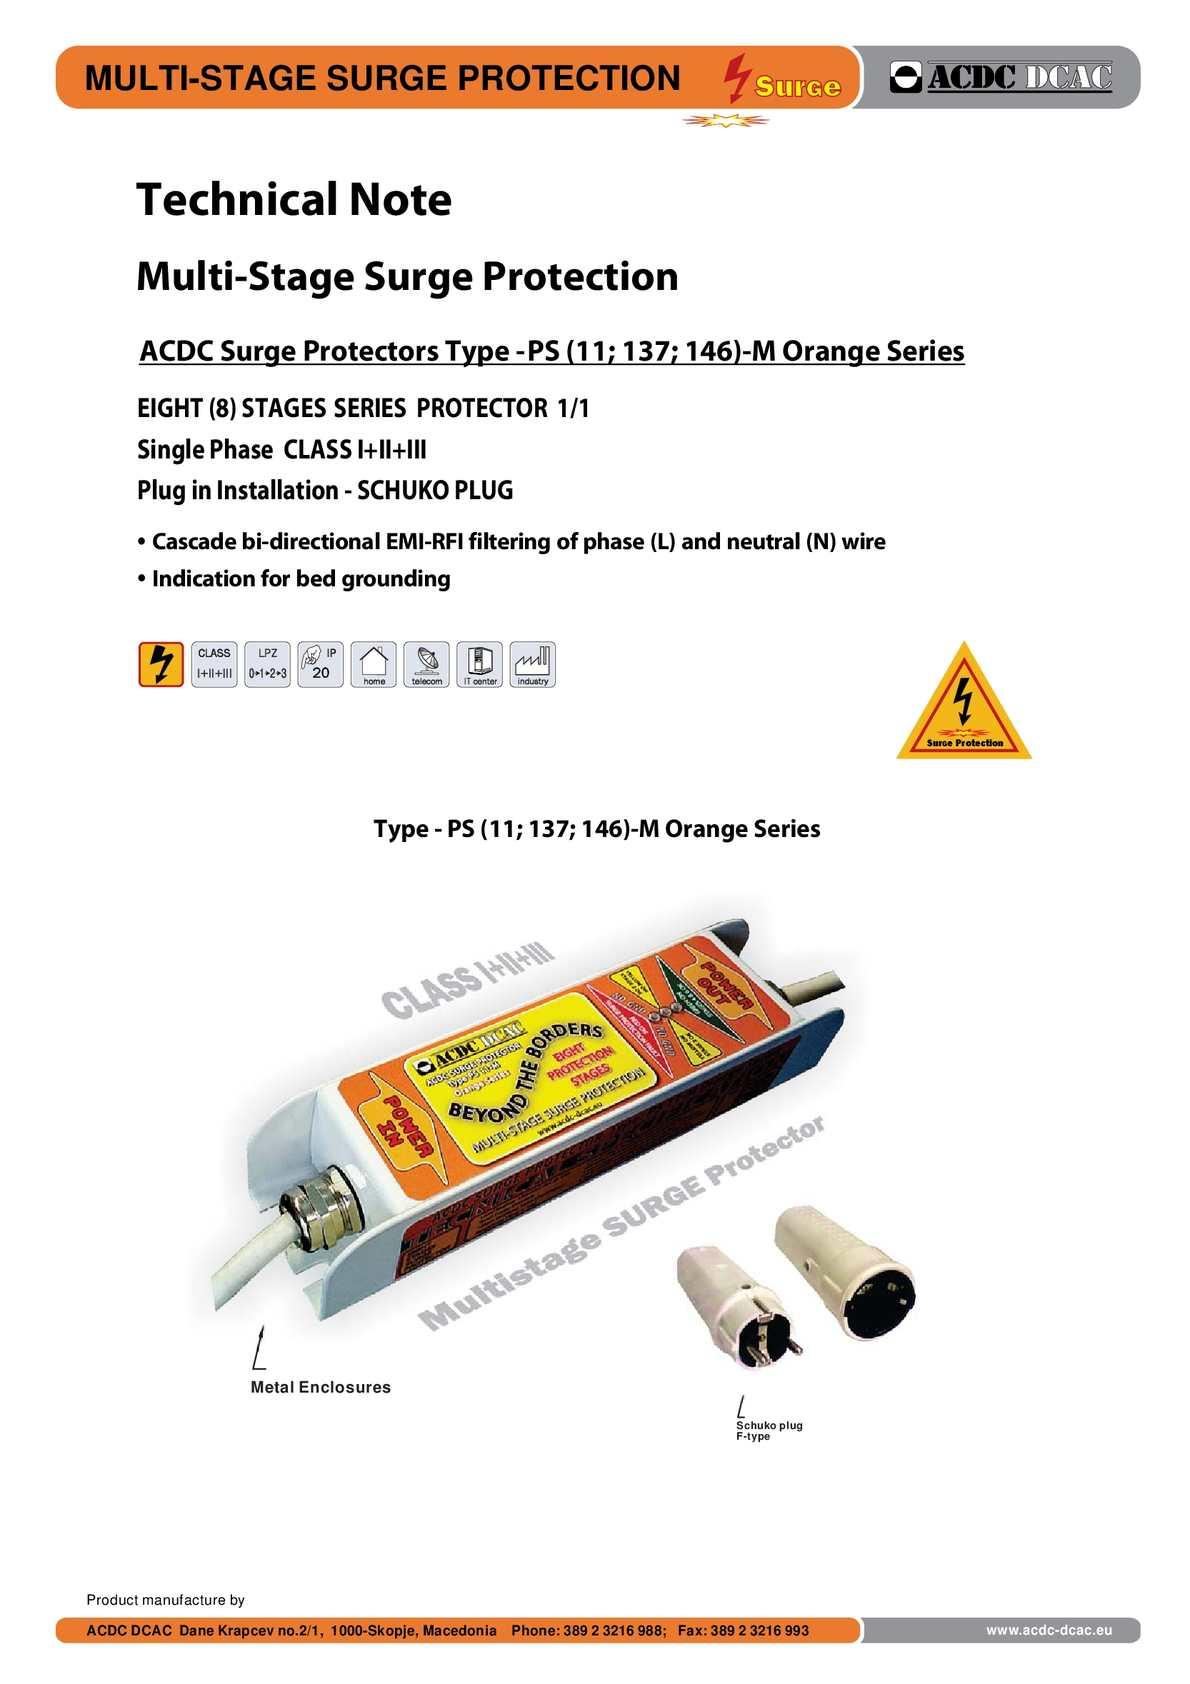 Calamo Acdc Surge Protector Technical Note Orange Series Schuko Plug Wiring Diagram Http Shopacdc Dcaceu